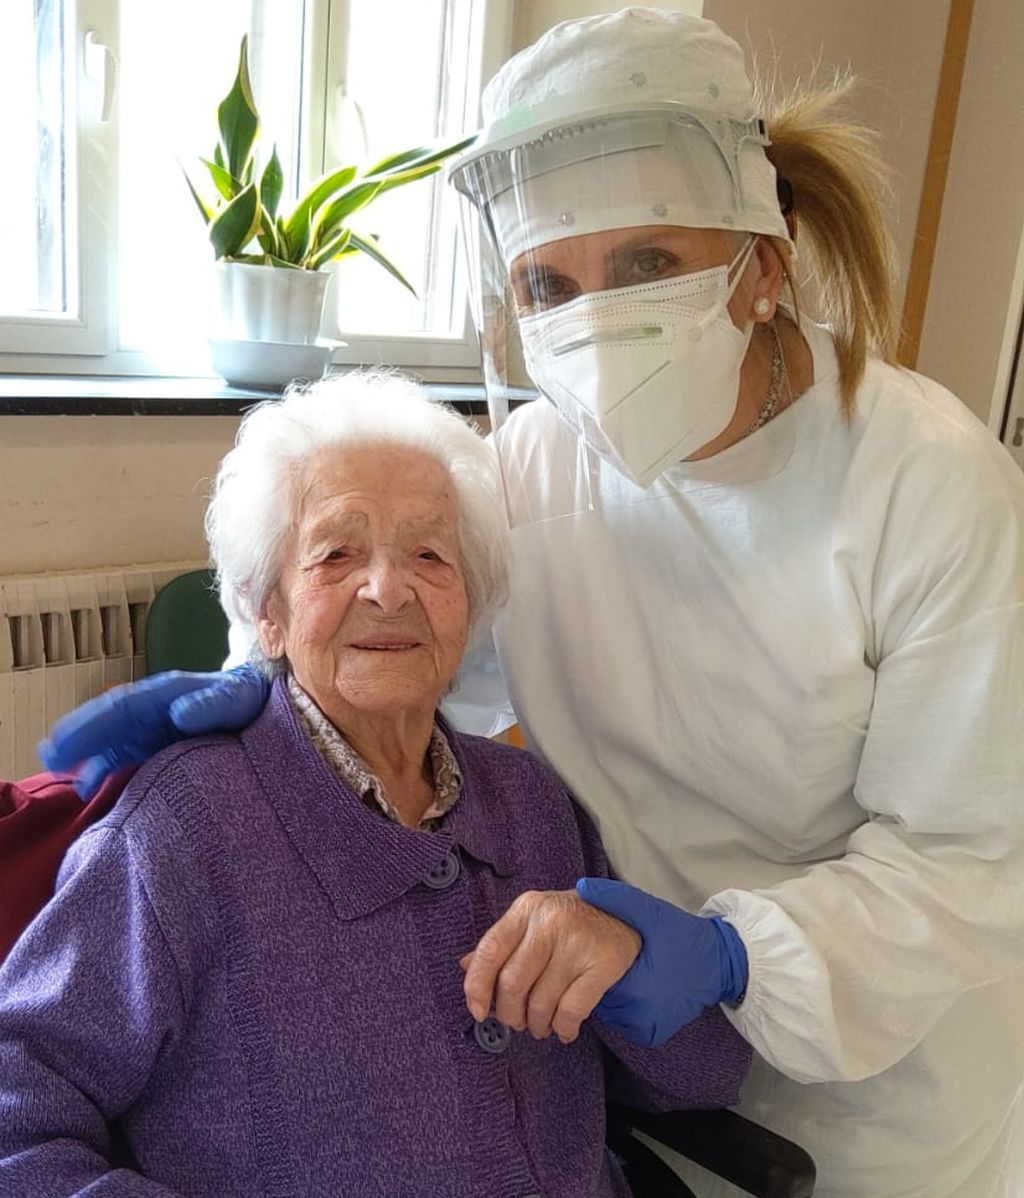 La centenaria Juana López  junto a su cuidadora Mertxe Elorriaga.